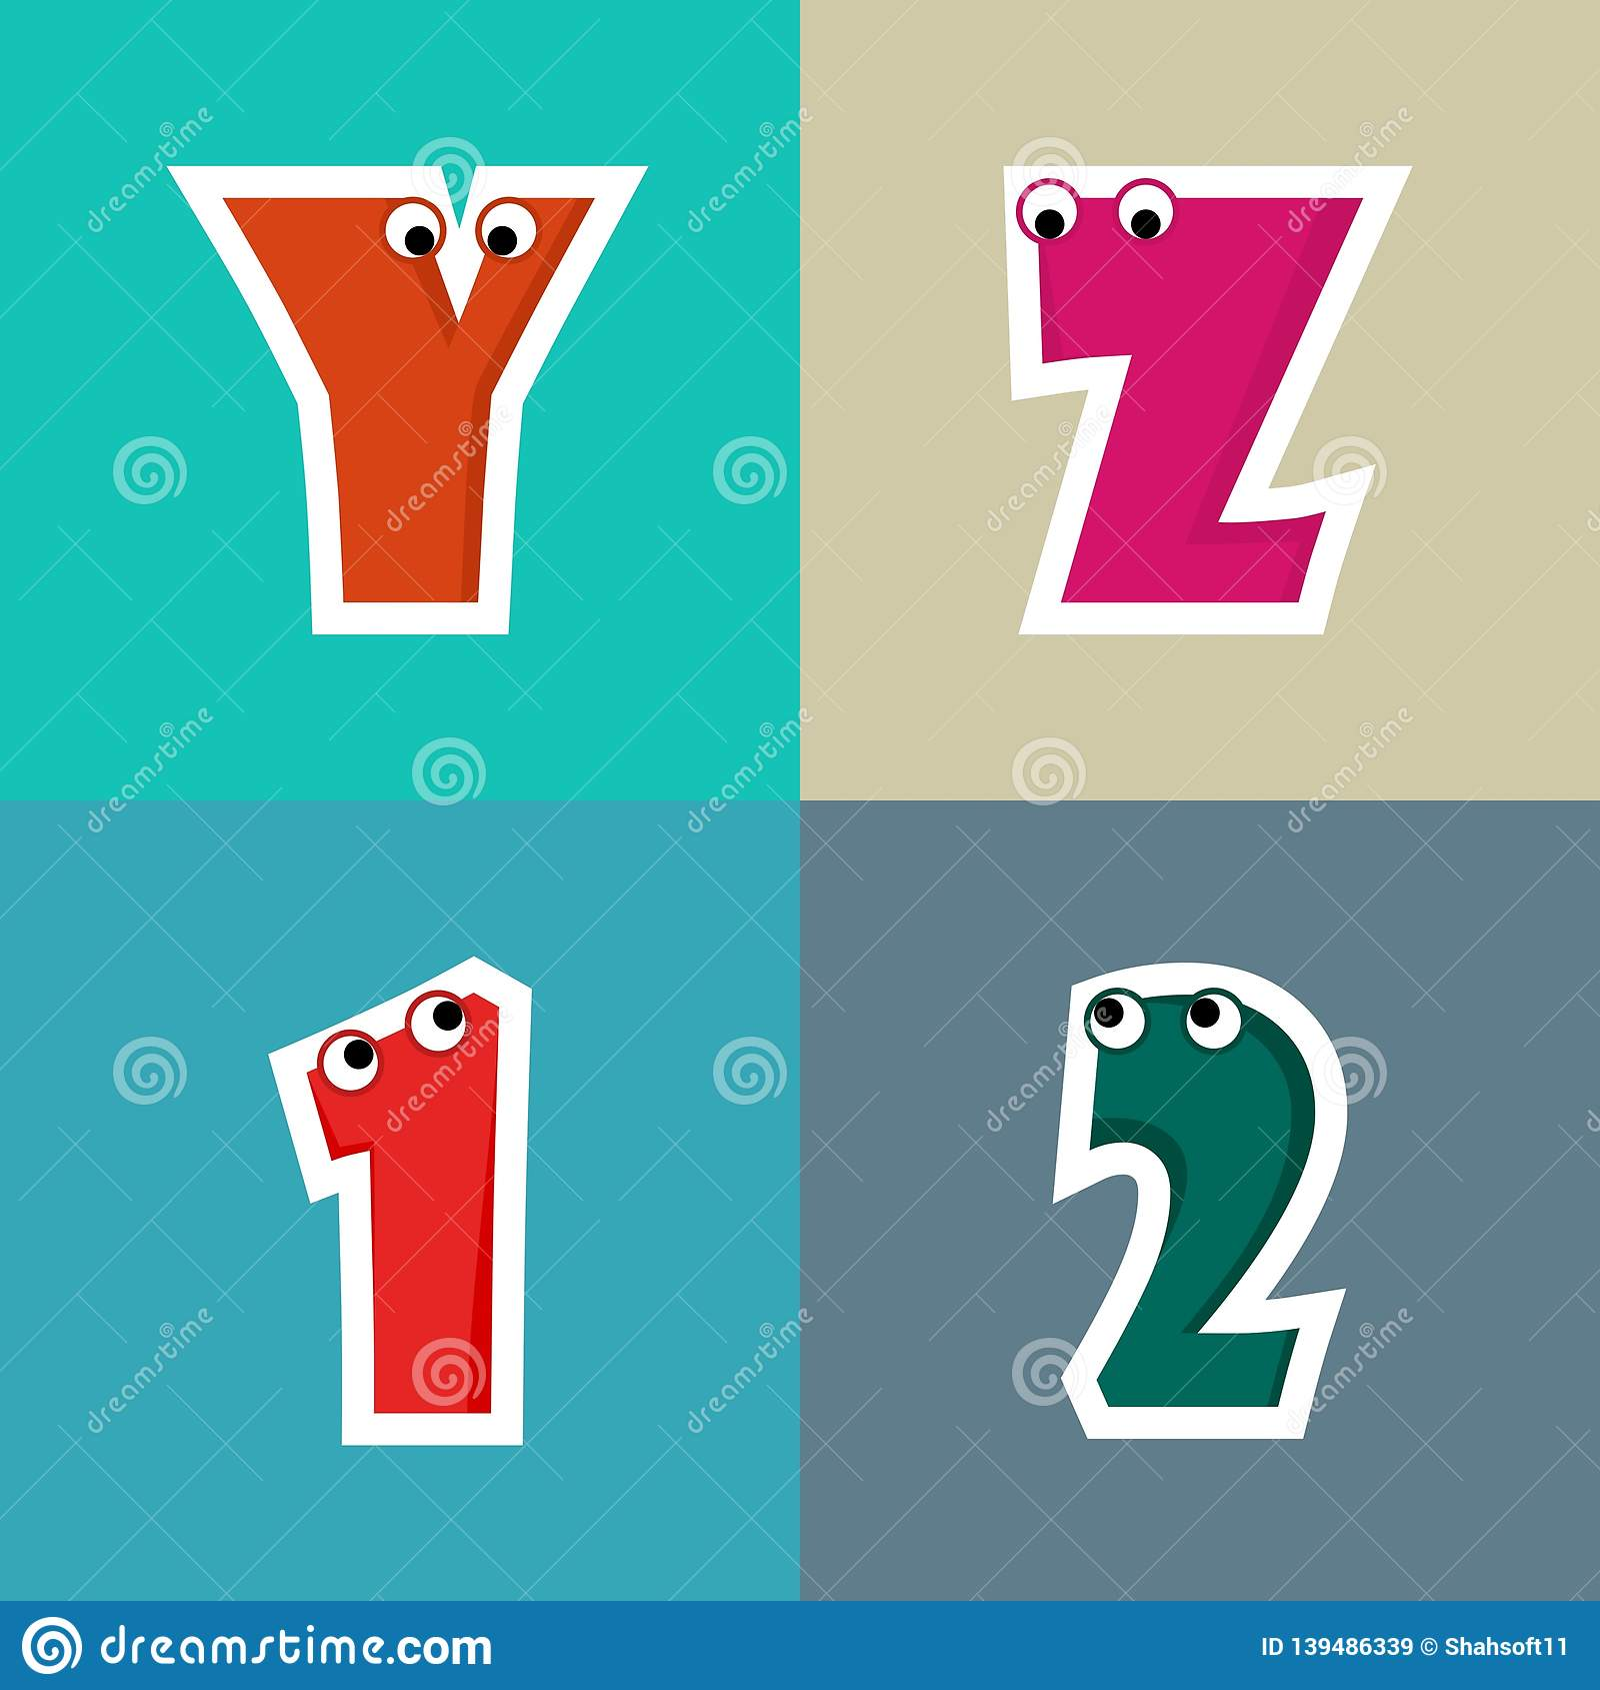 Creative Alphabet Cartoon Illustration for Kids